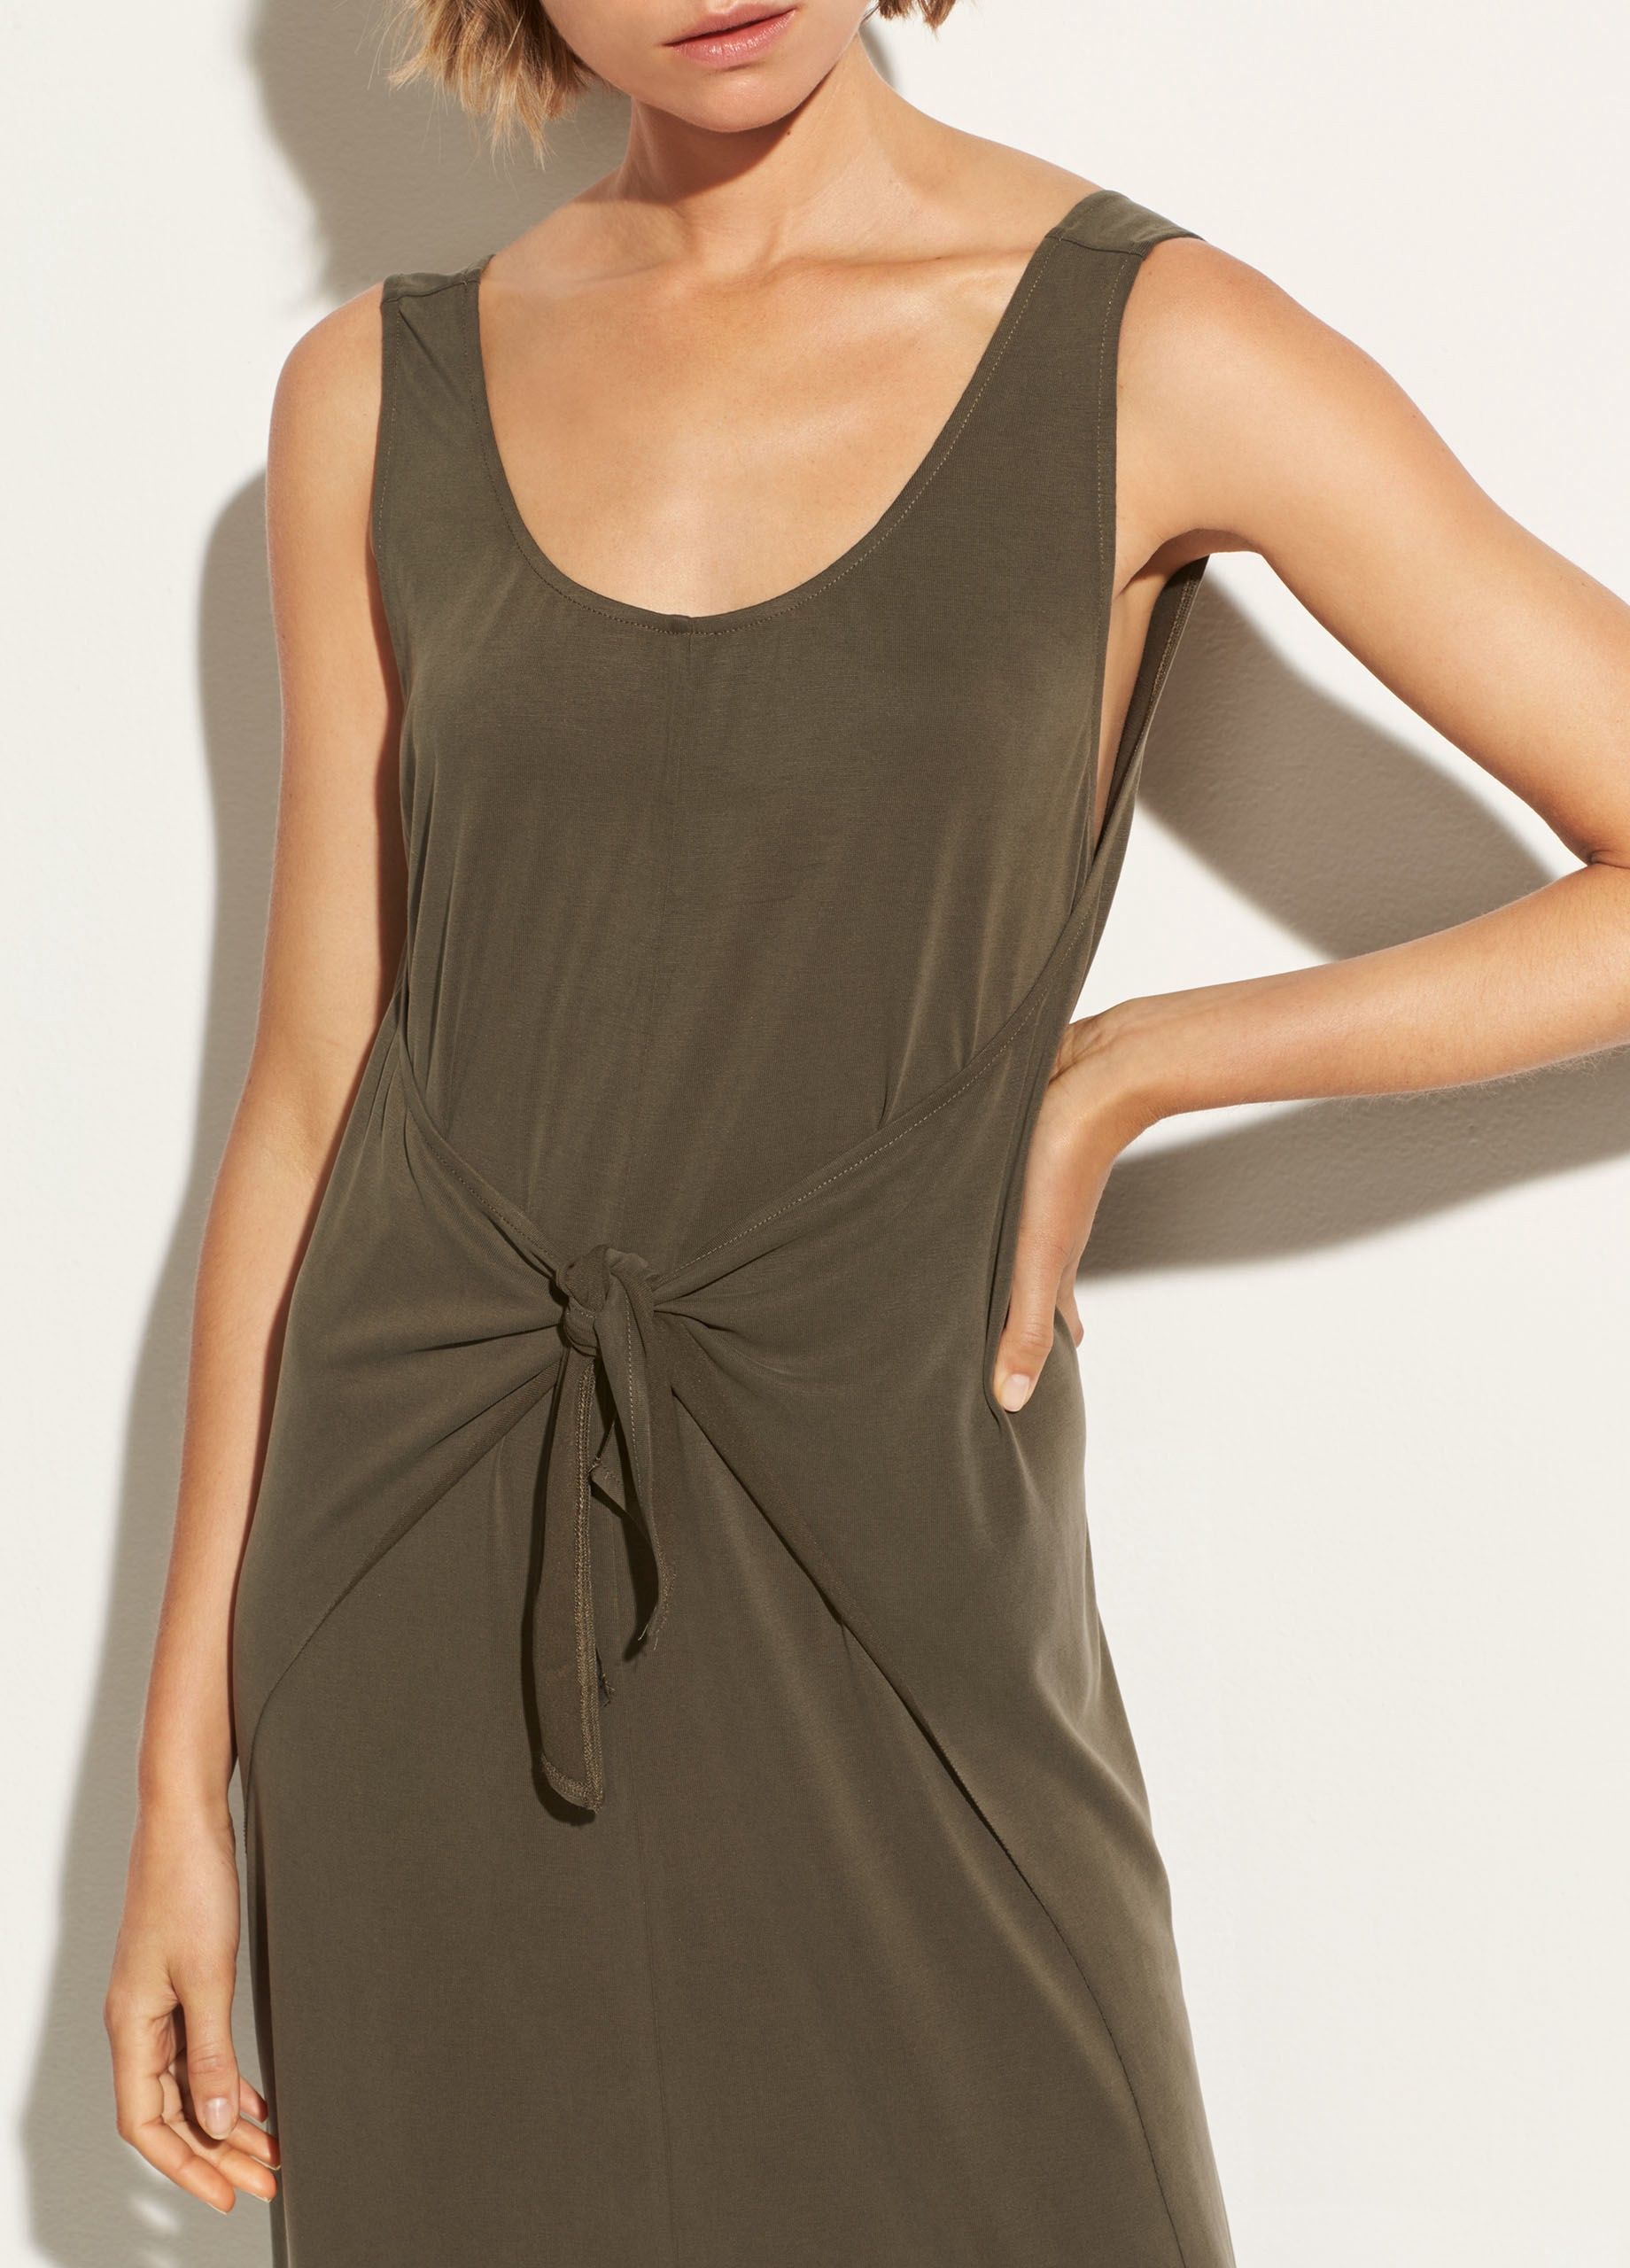 Vince Sleeveless Wrap Dress Bayleaf M Sleeveless Wrap Dress Dresses Wrap Dress [ 2560 x 1840 Pixel ]